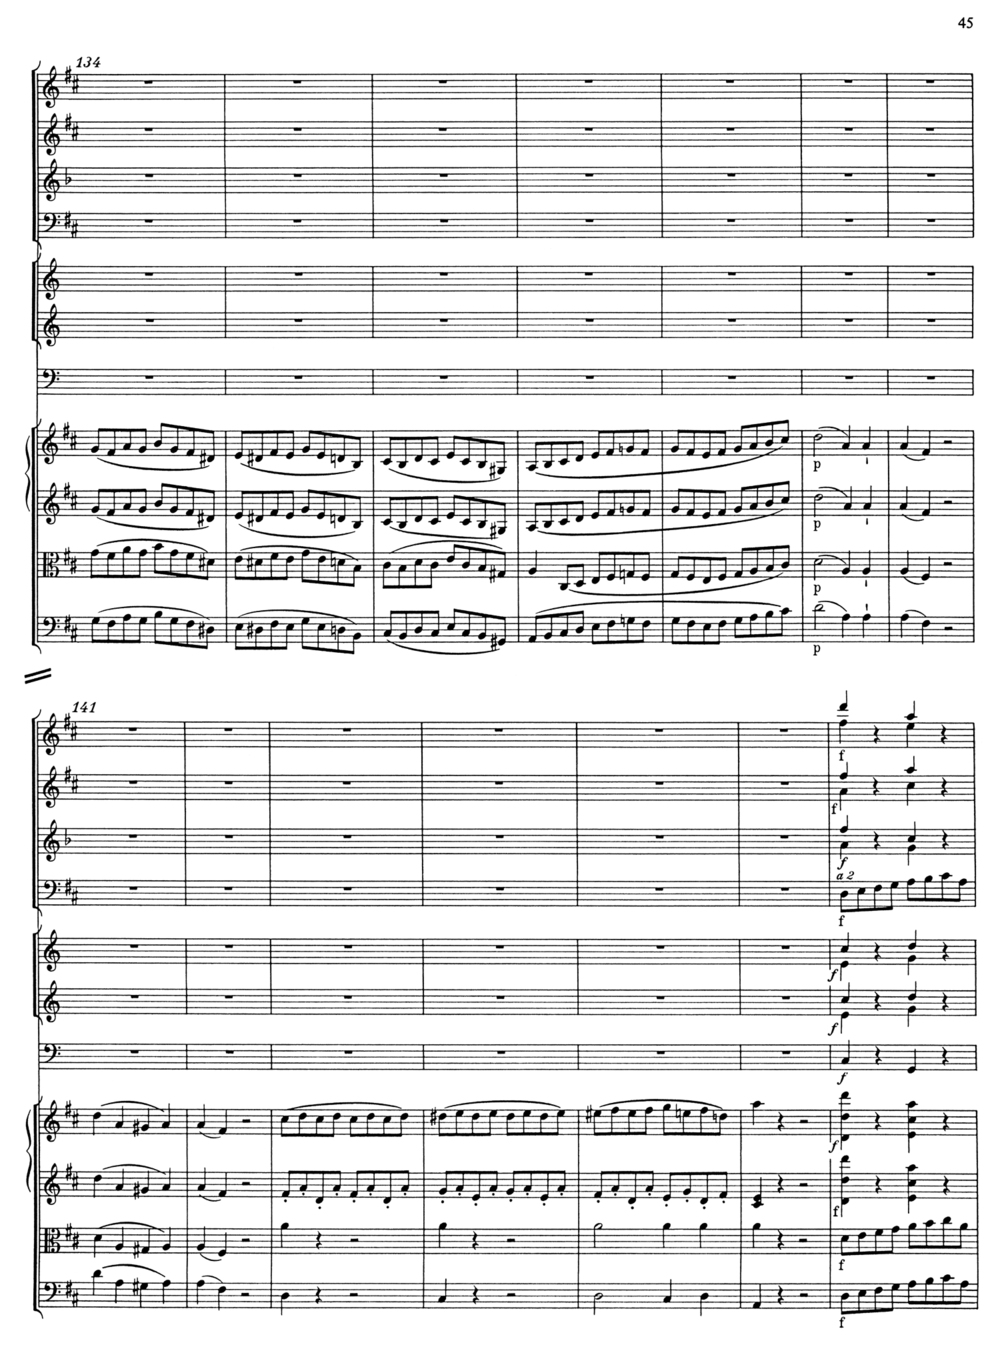 Haffner SCORE page 5.jpg